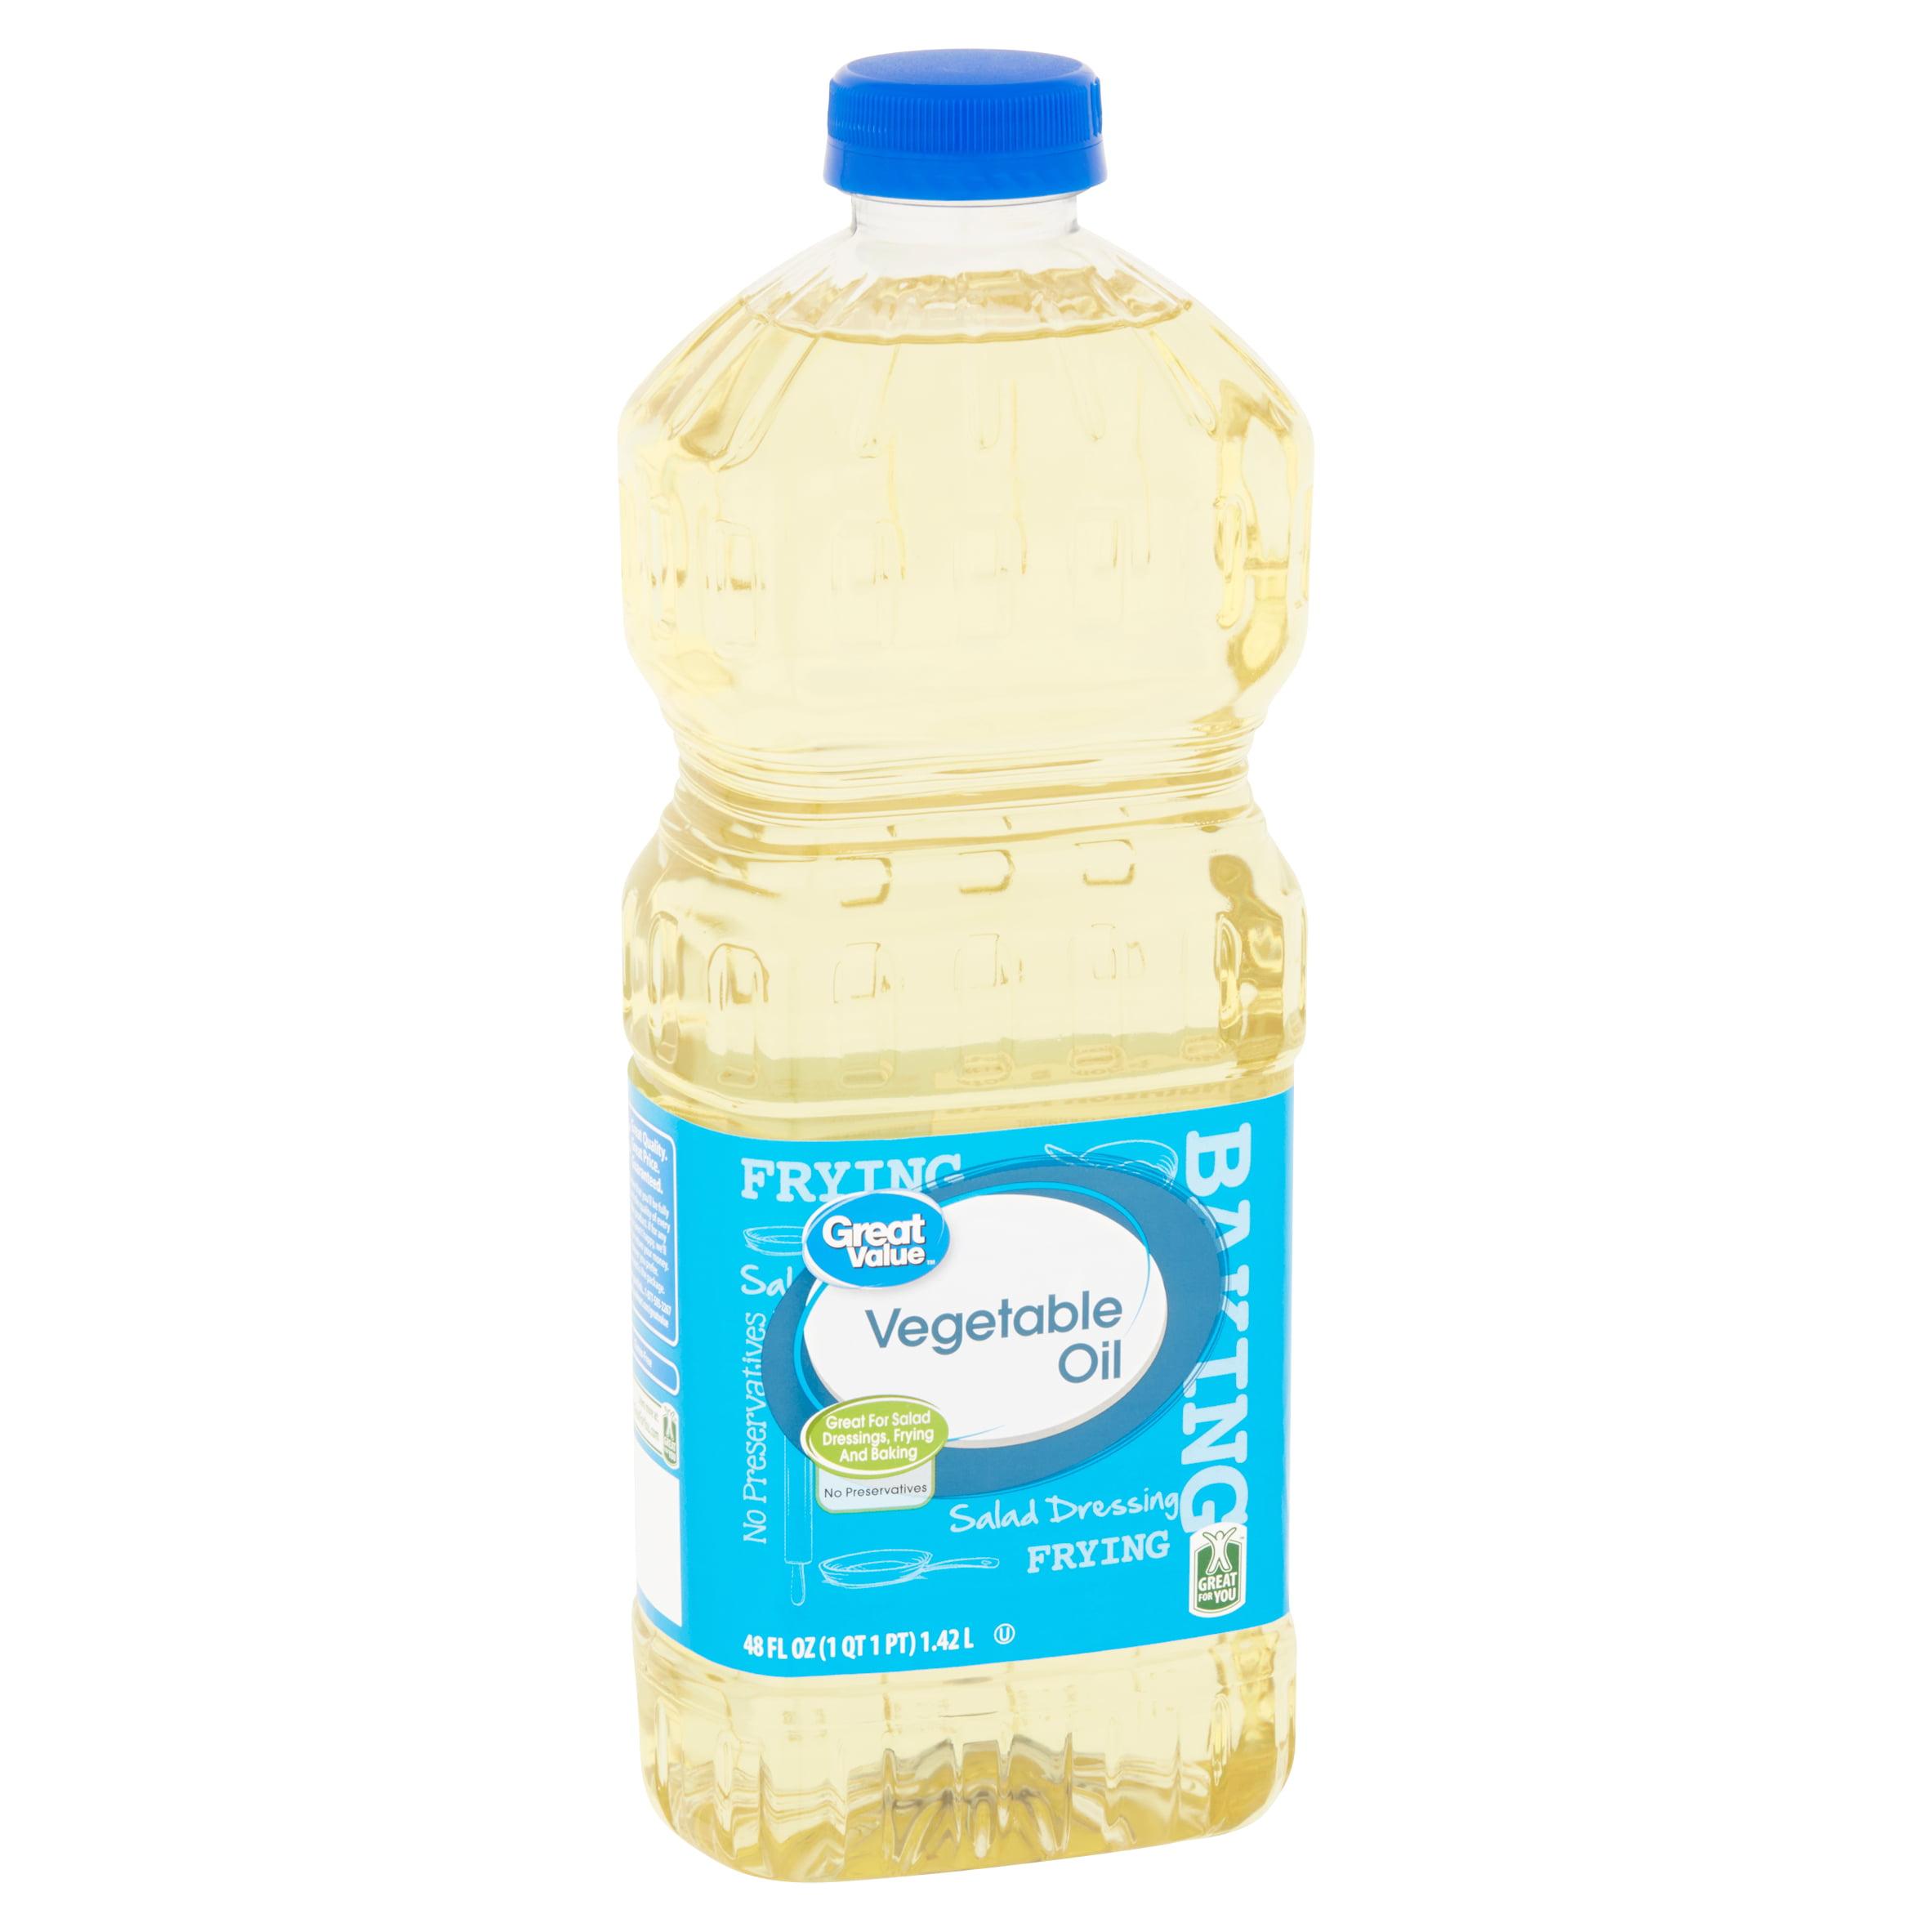 (3 Pack) Great Value Vegetable Oil, 48 fl oz